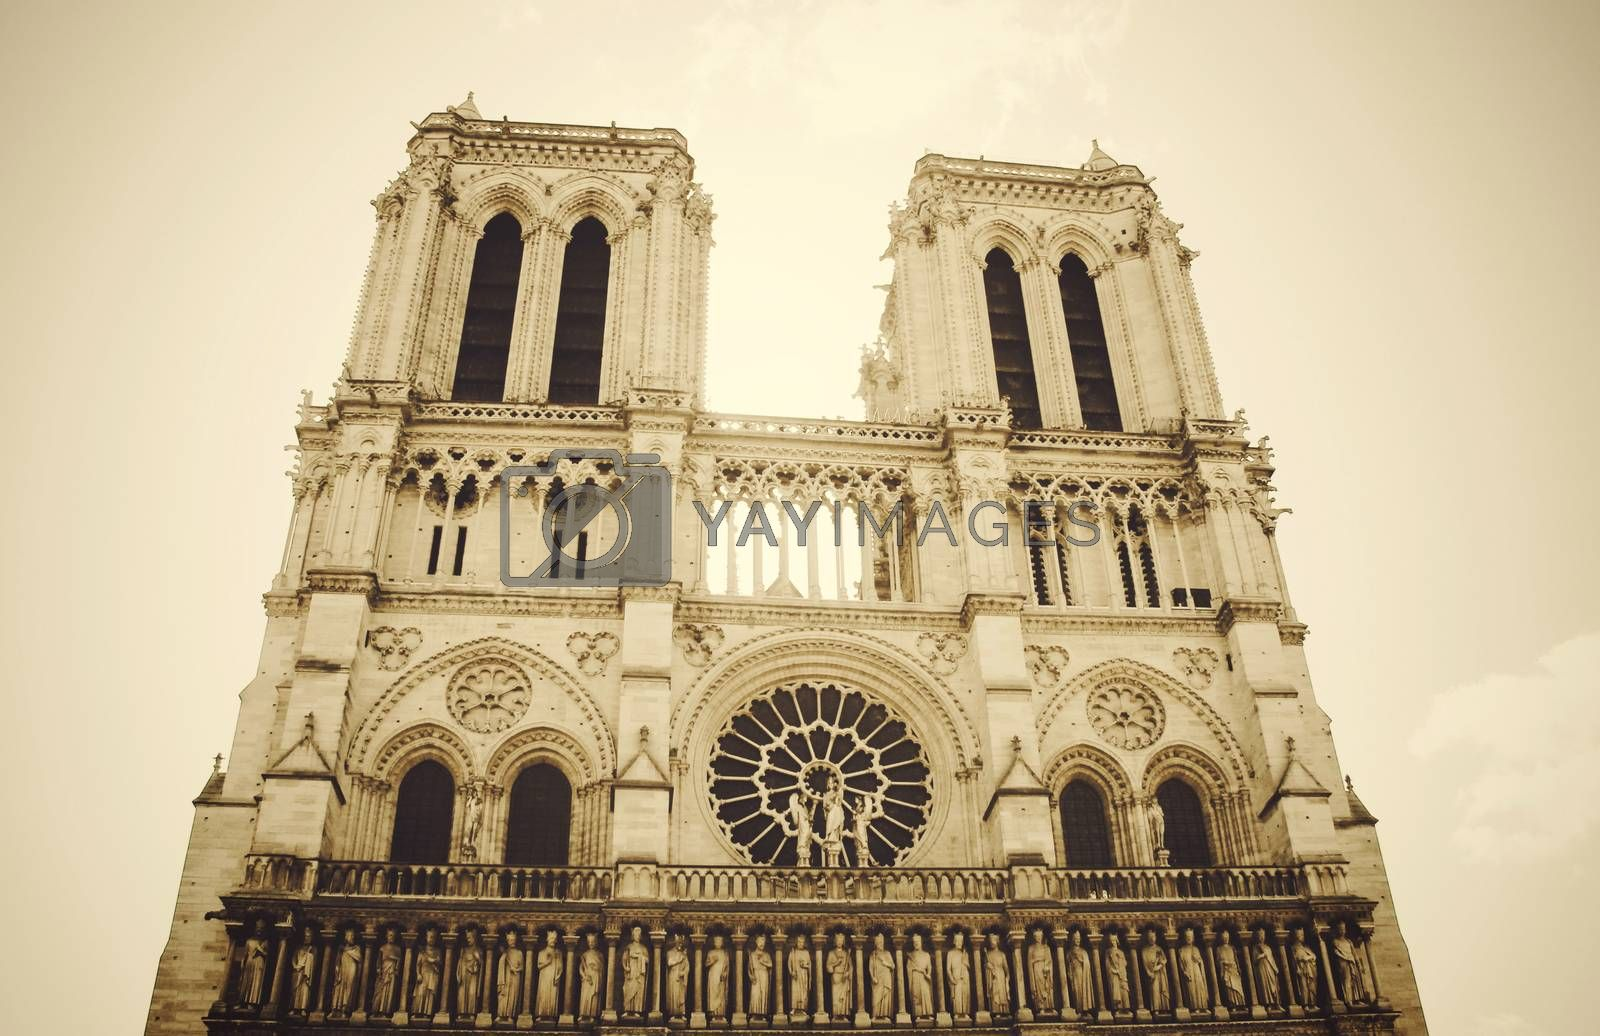 Notre Dame de Paris with sepia toned